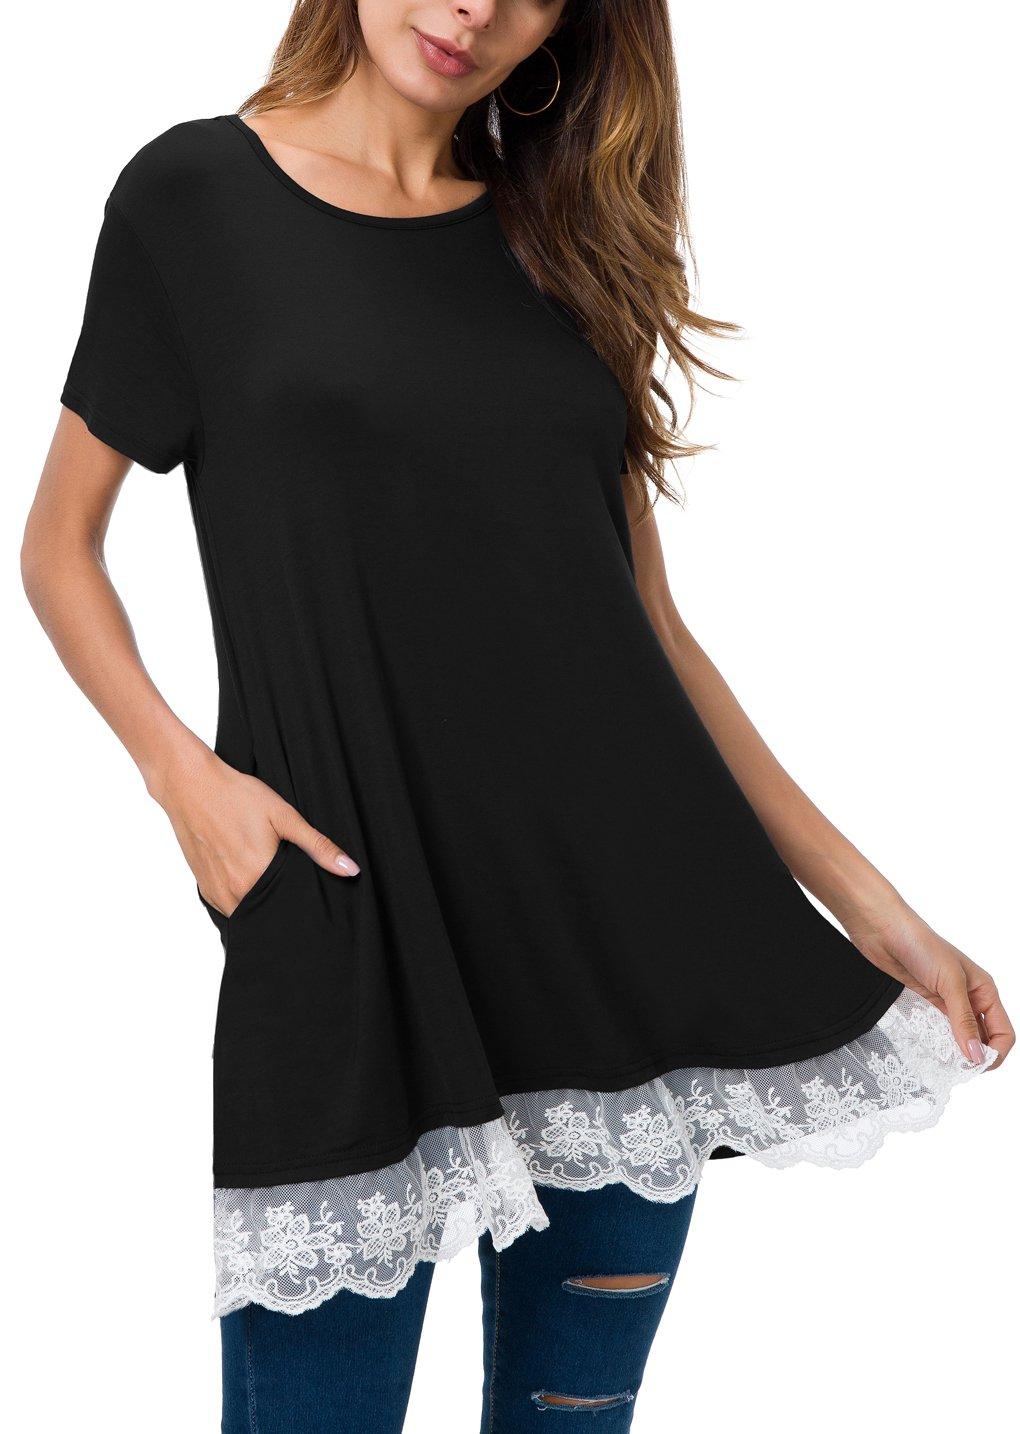 Mounblun Women Lace Short Sleeve Tunic Top Blouse with Pocket (XX-Large, Shortsleeve-Black)